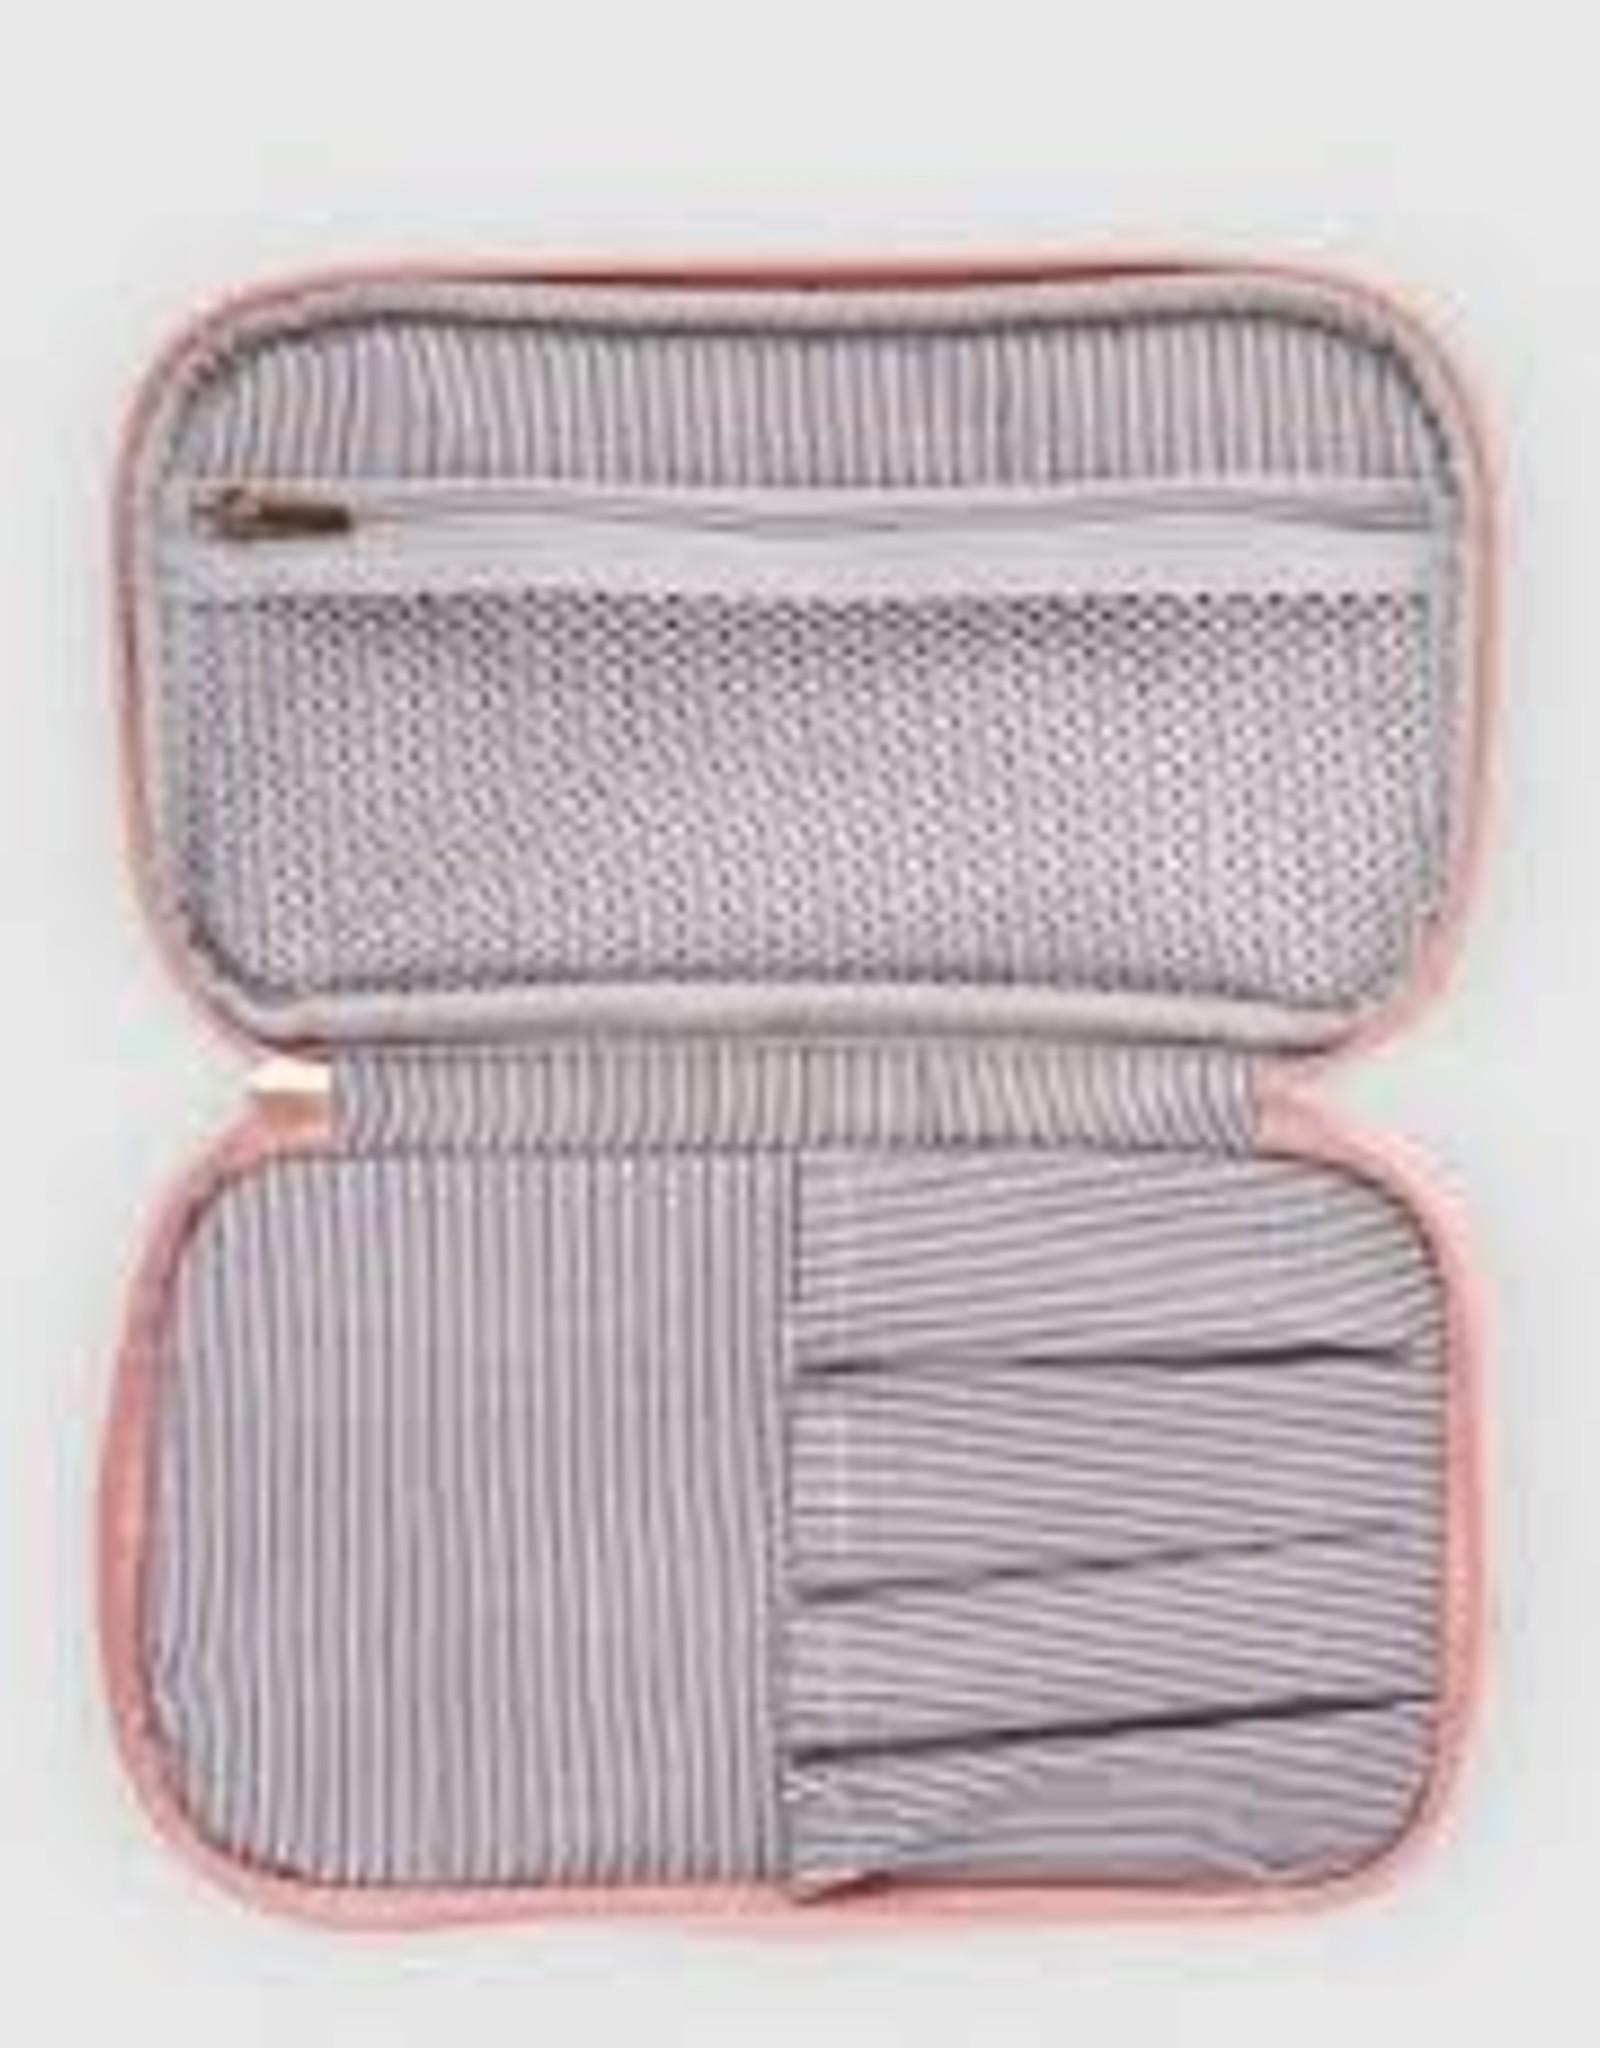 Rosie Pale Pink Makeup Case